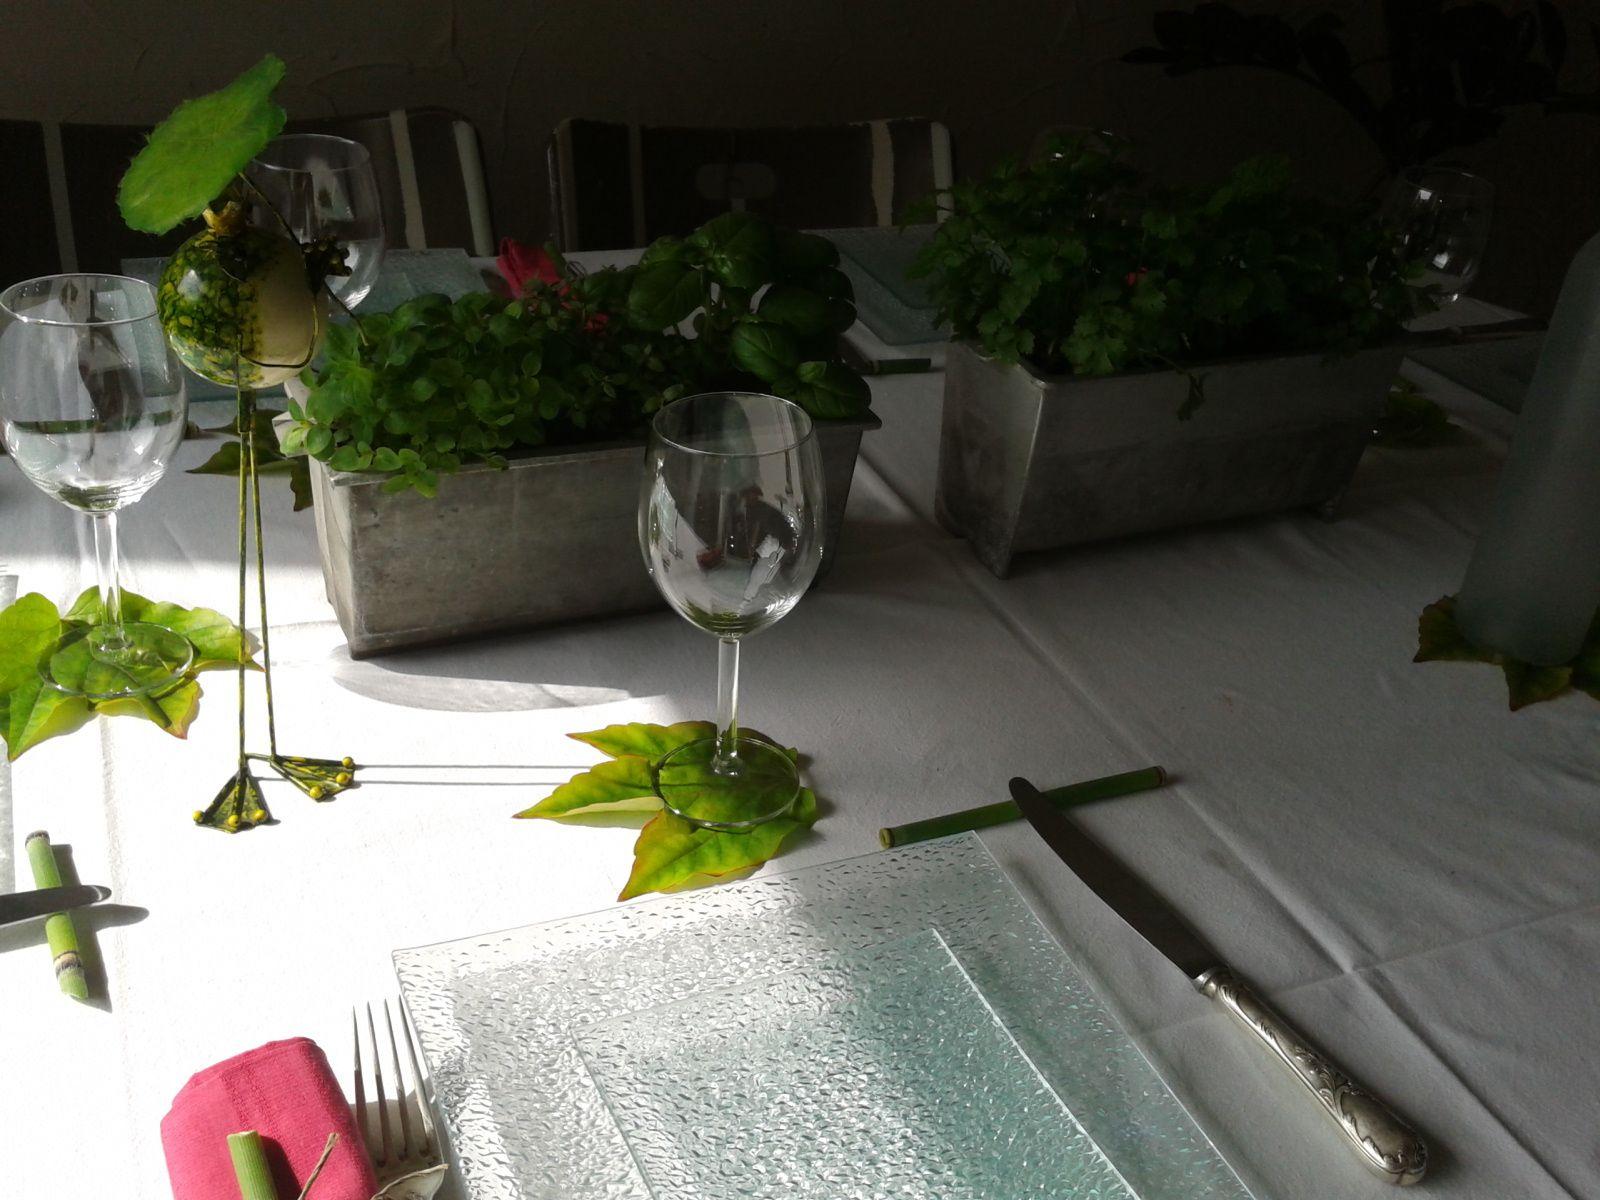 petites herbes aromatiques de ma terrasse....